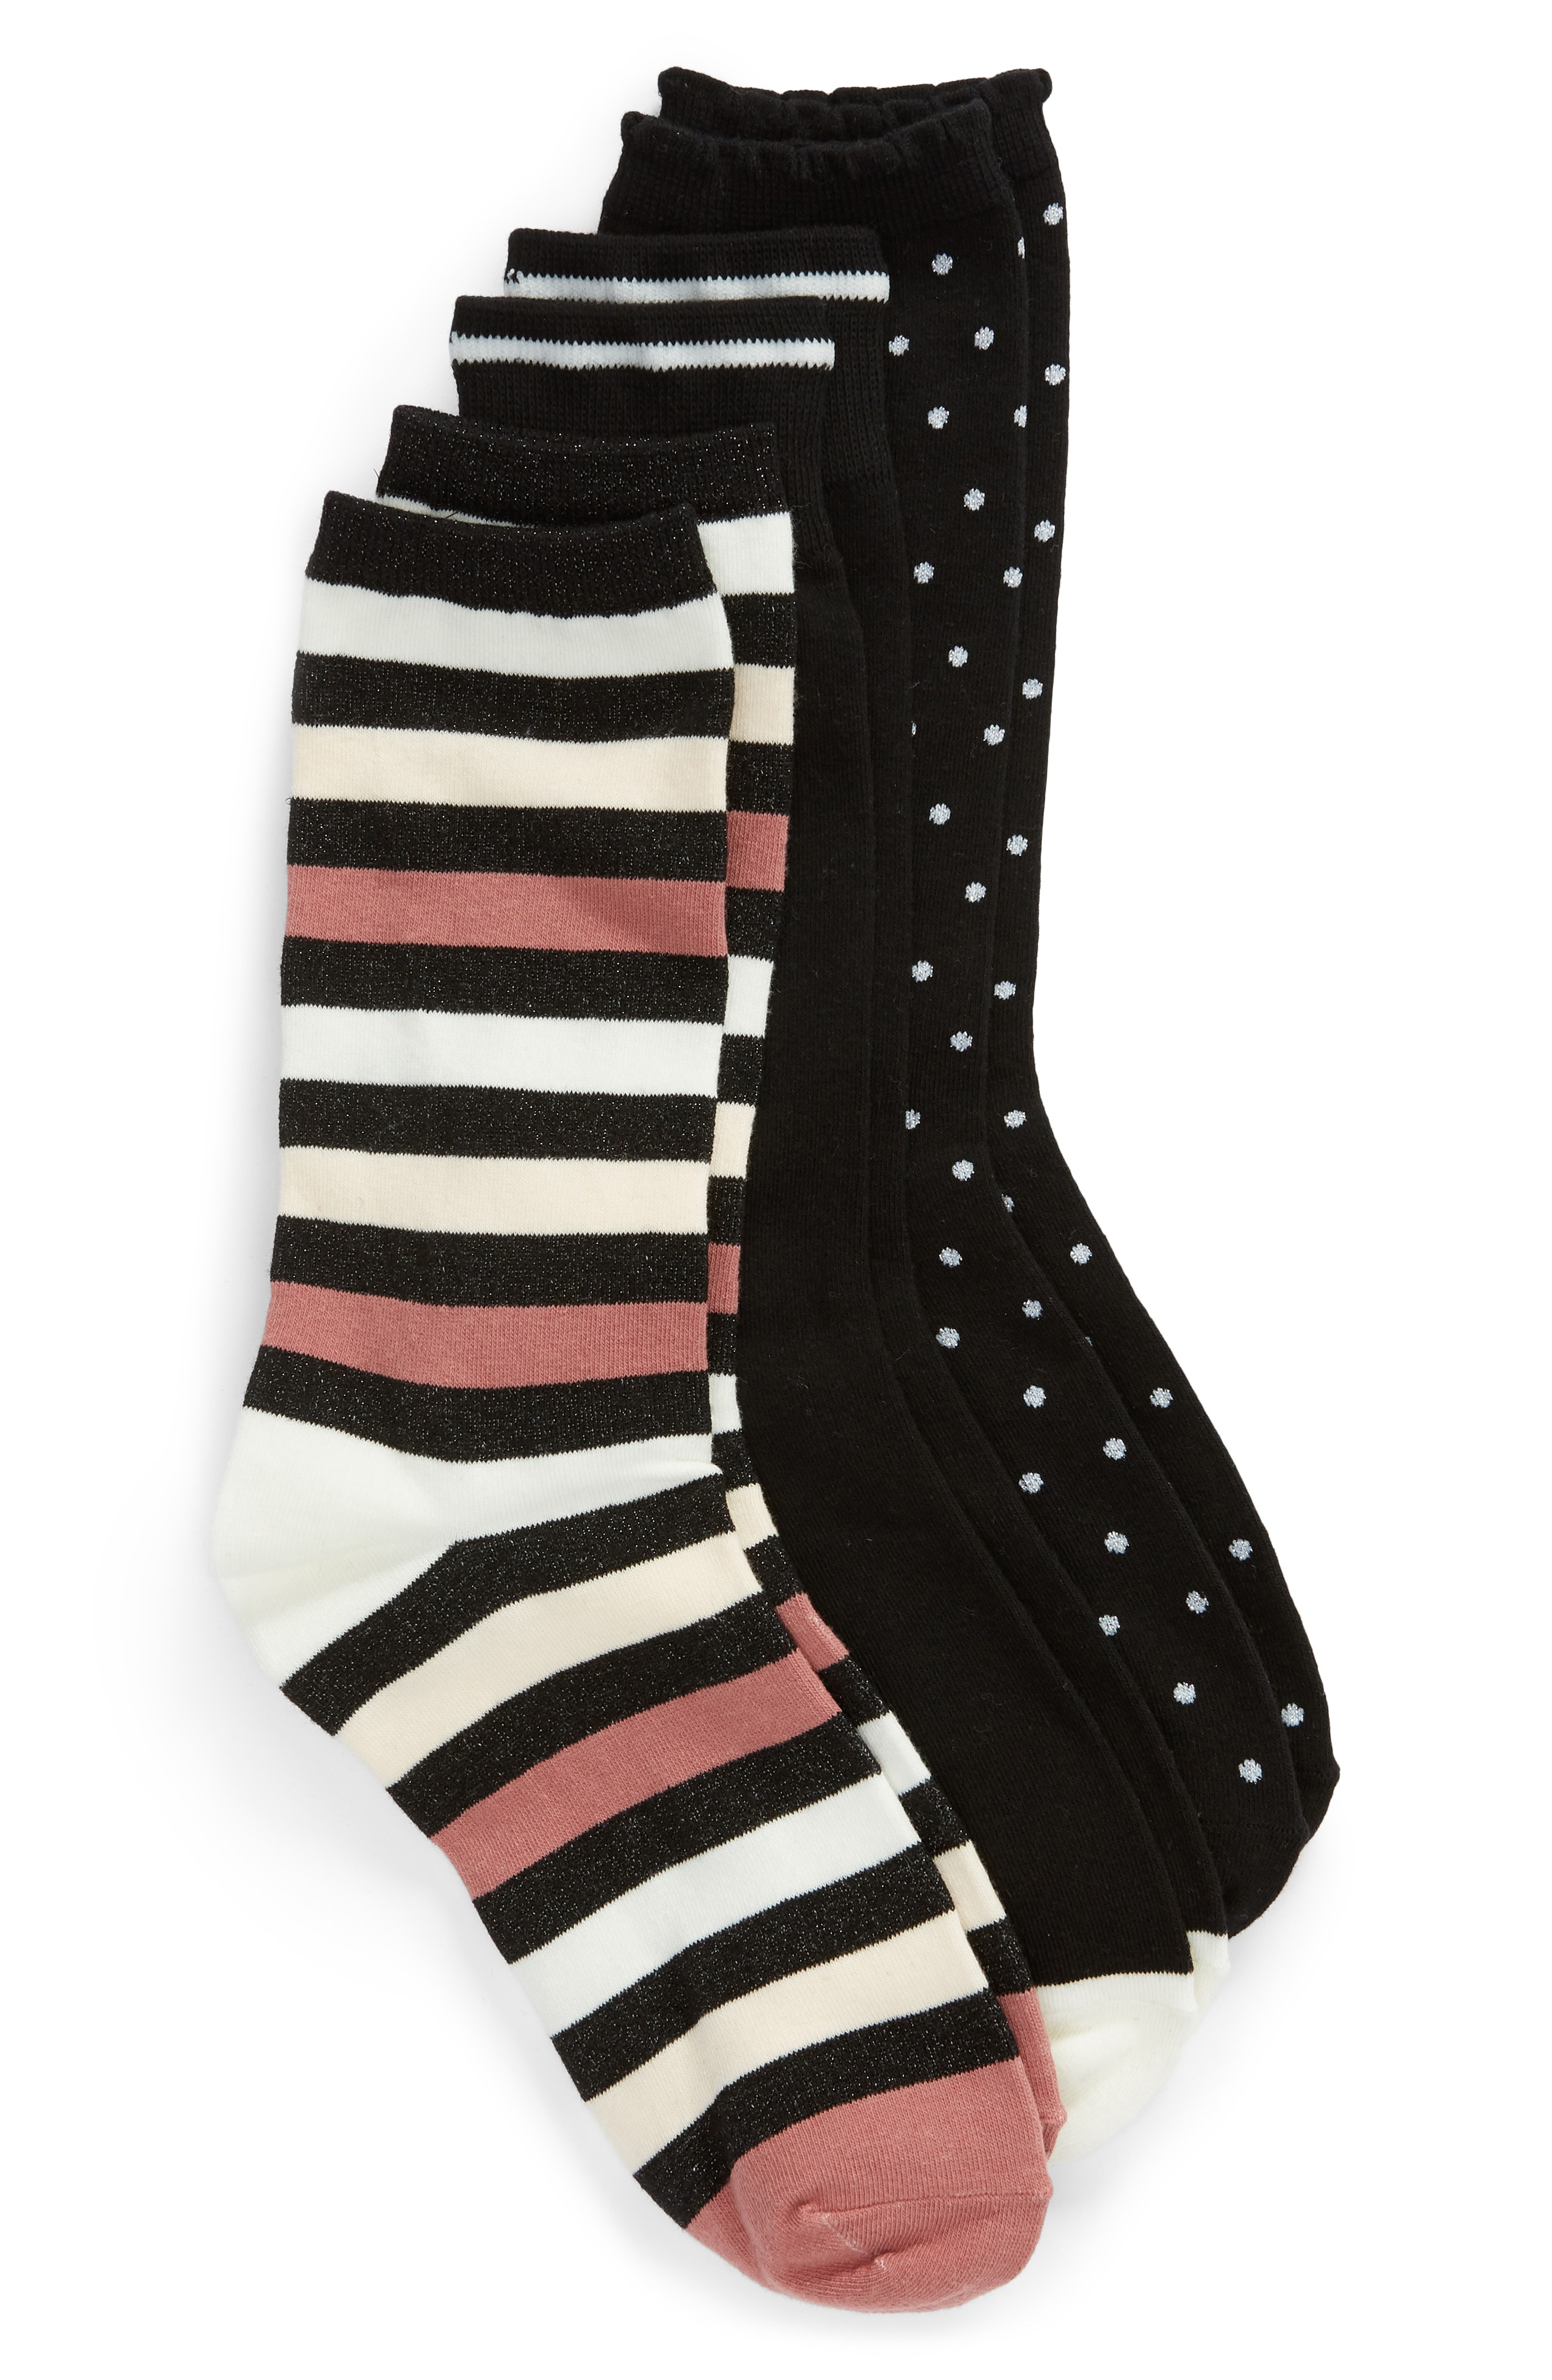 kate spade new york 3-pack crew socks